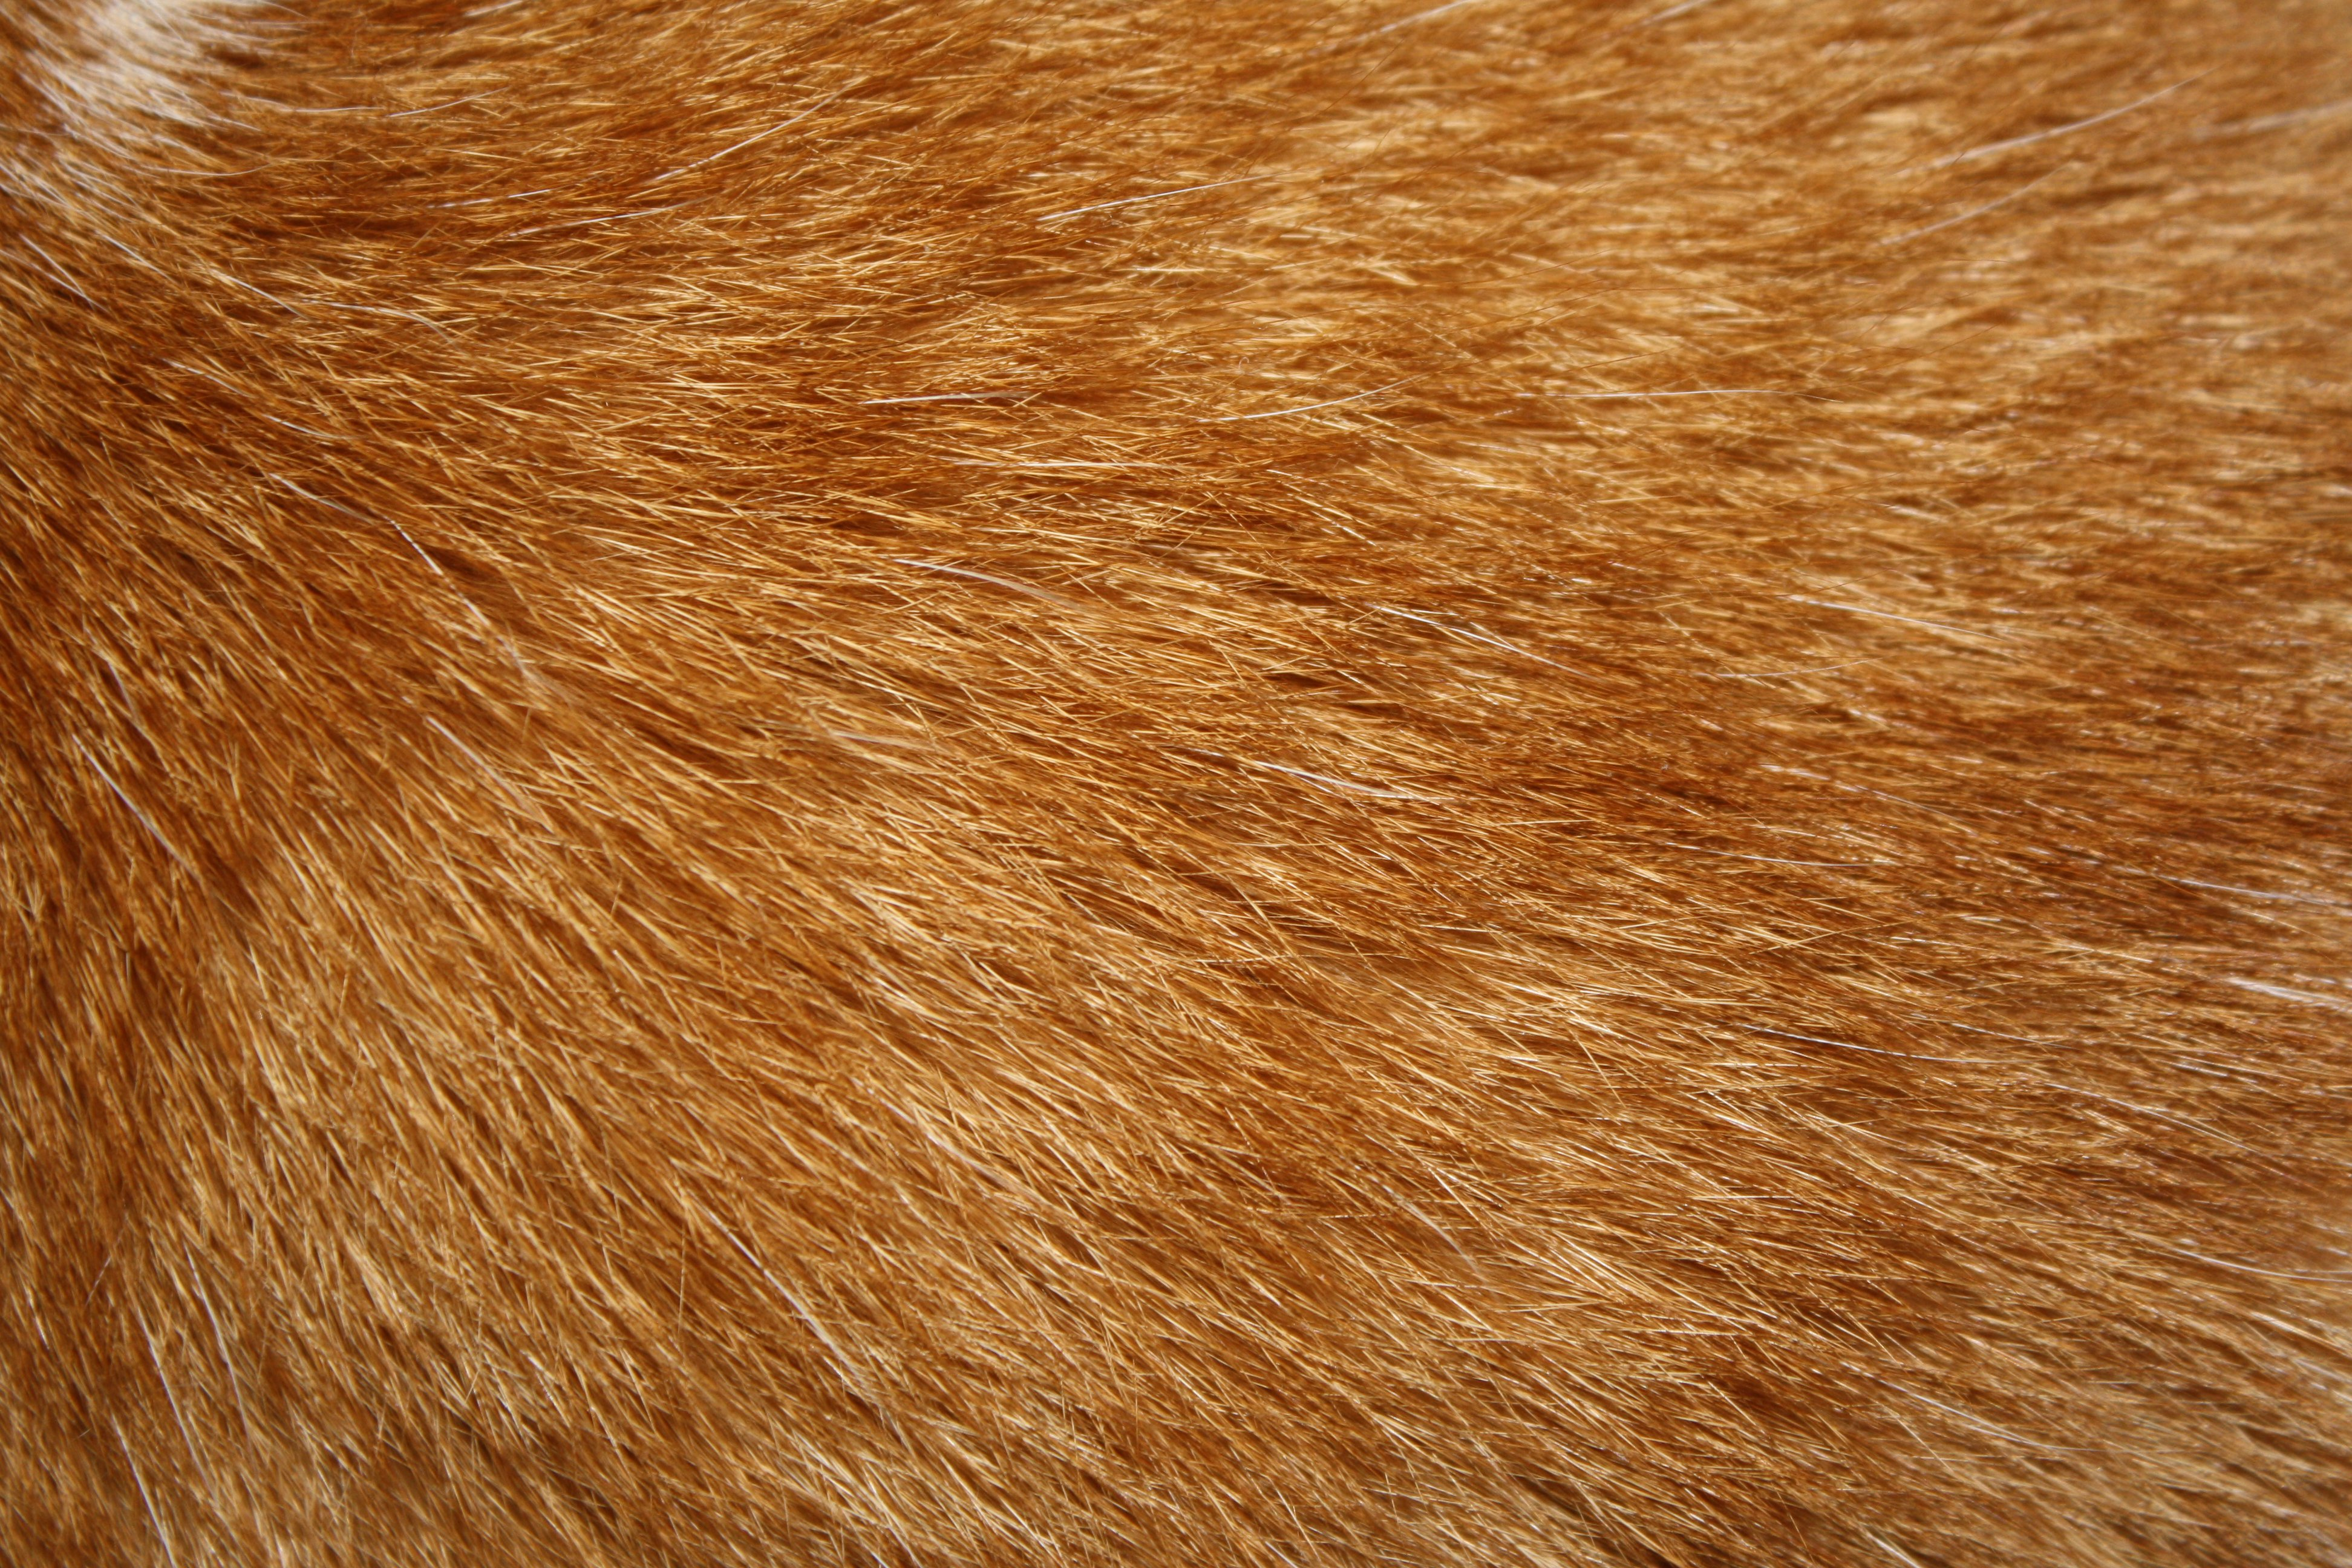 Fur texture clipart jpg freeuse stock Orange Tabby Cat Fur Texture Picture | Free Photograph | Photos ... jpg freeuse stock